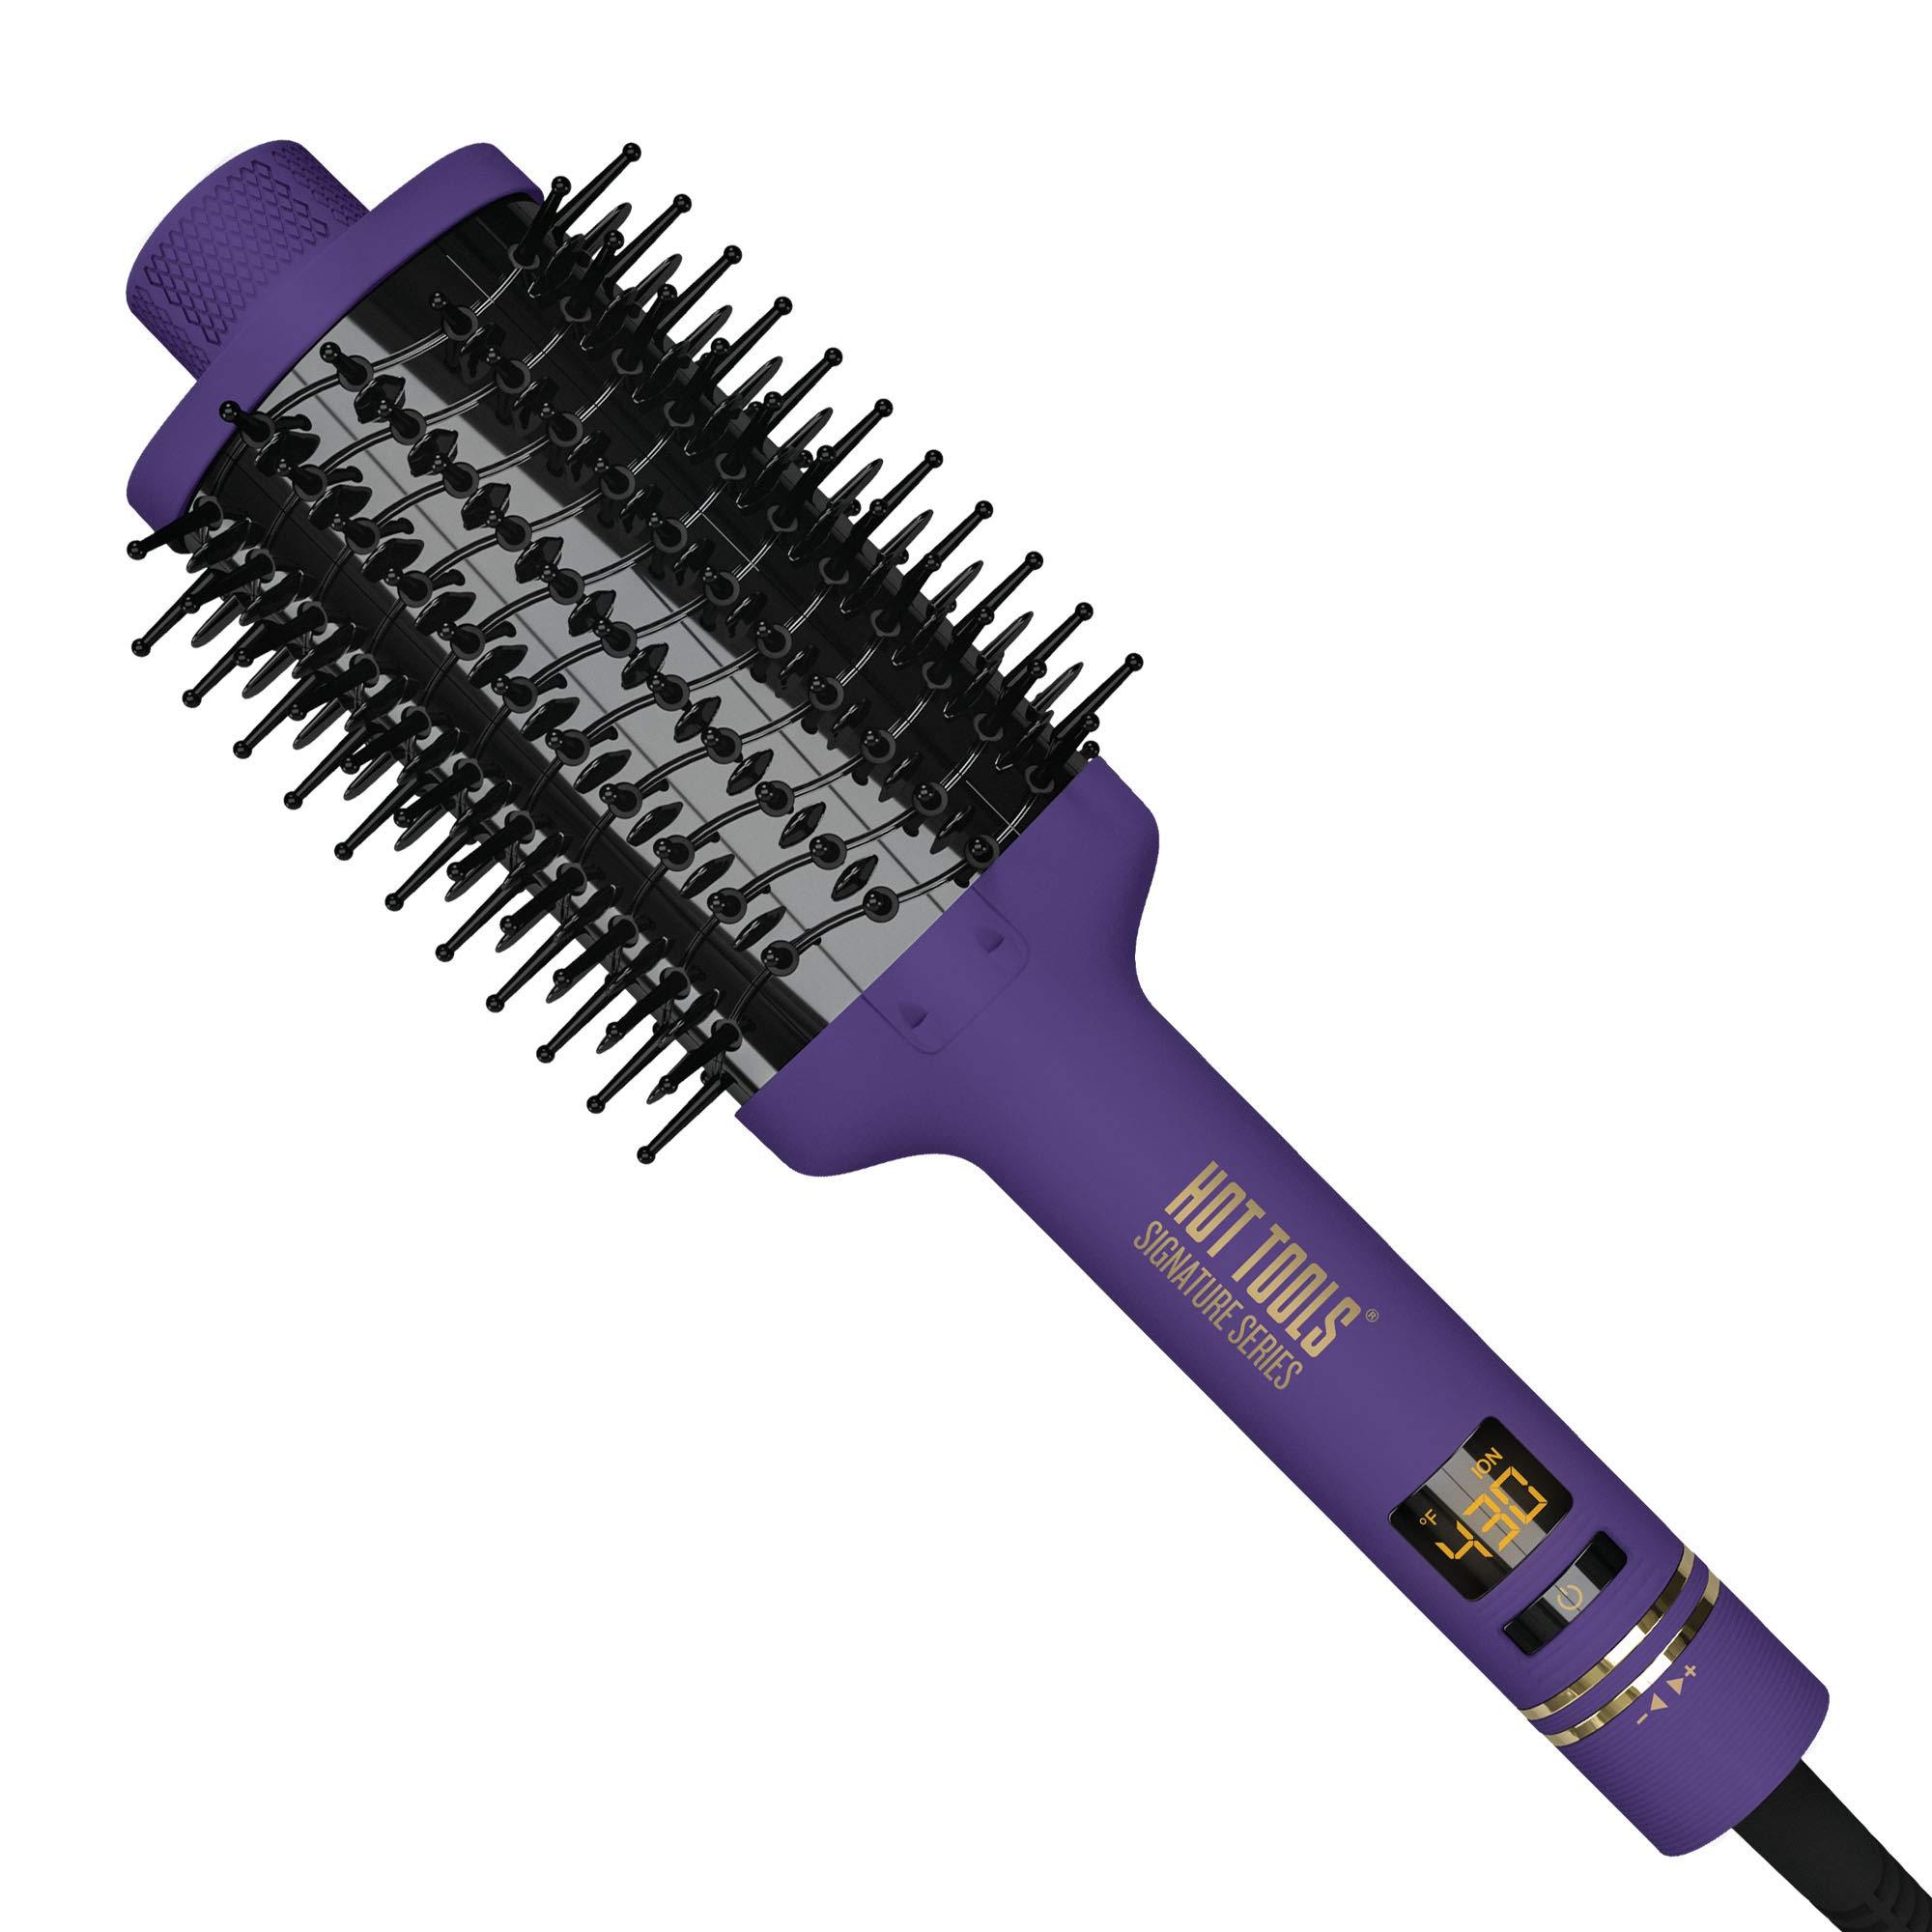 Hot Tools Signature Series Ultimate Heated- Hair Brush Styler